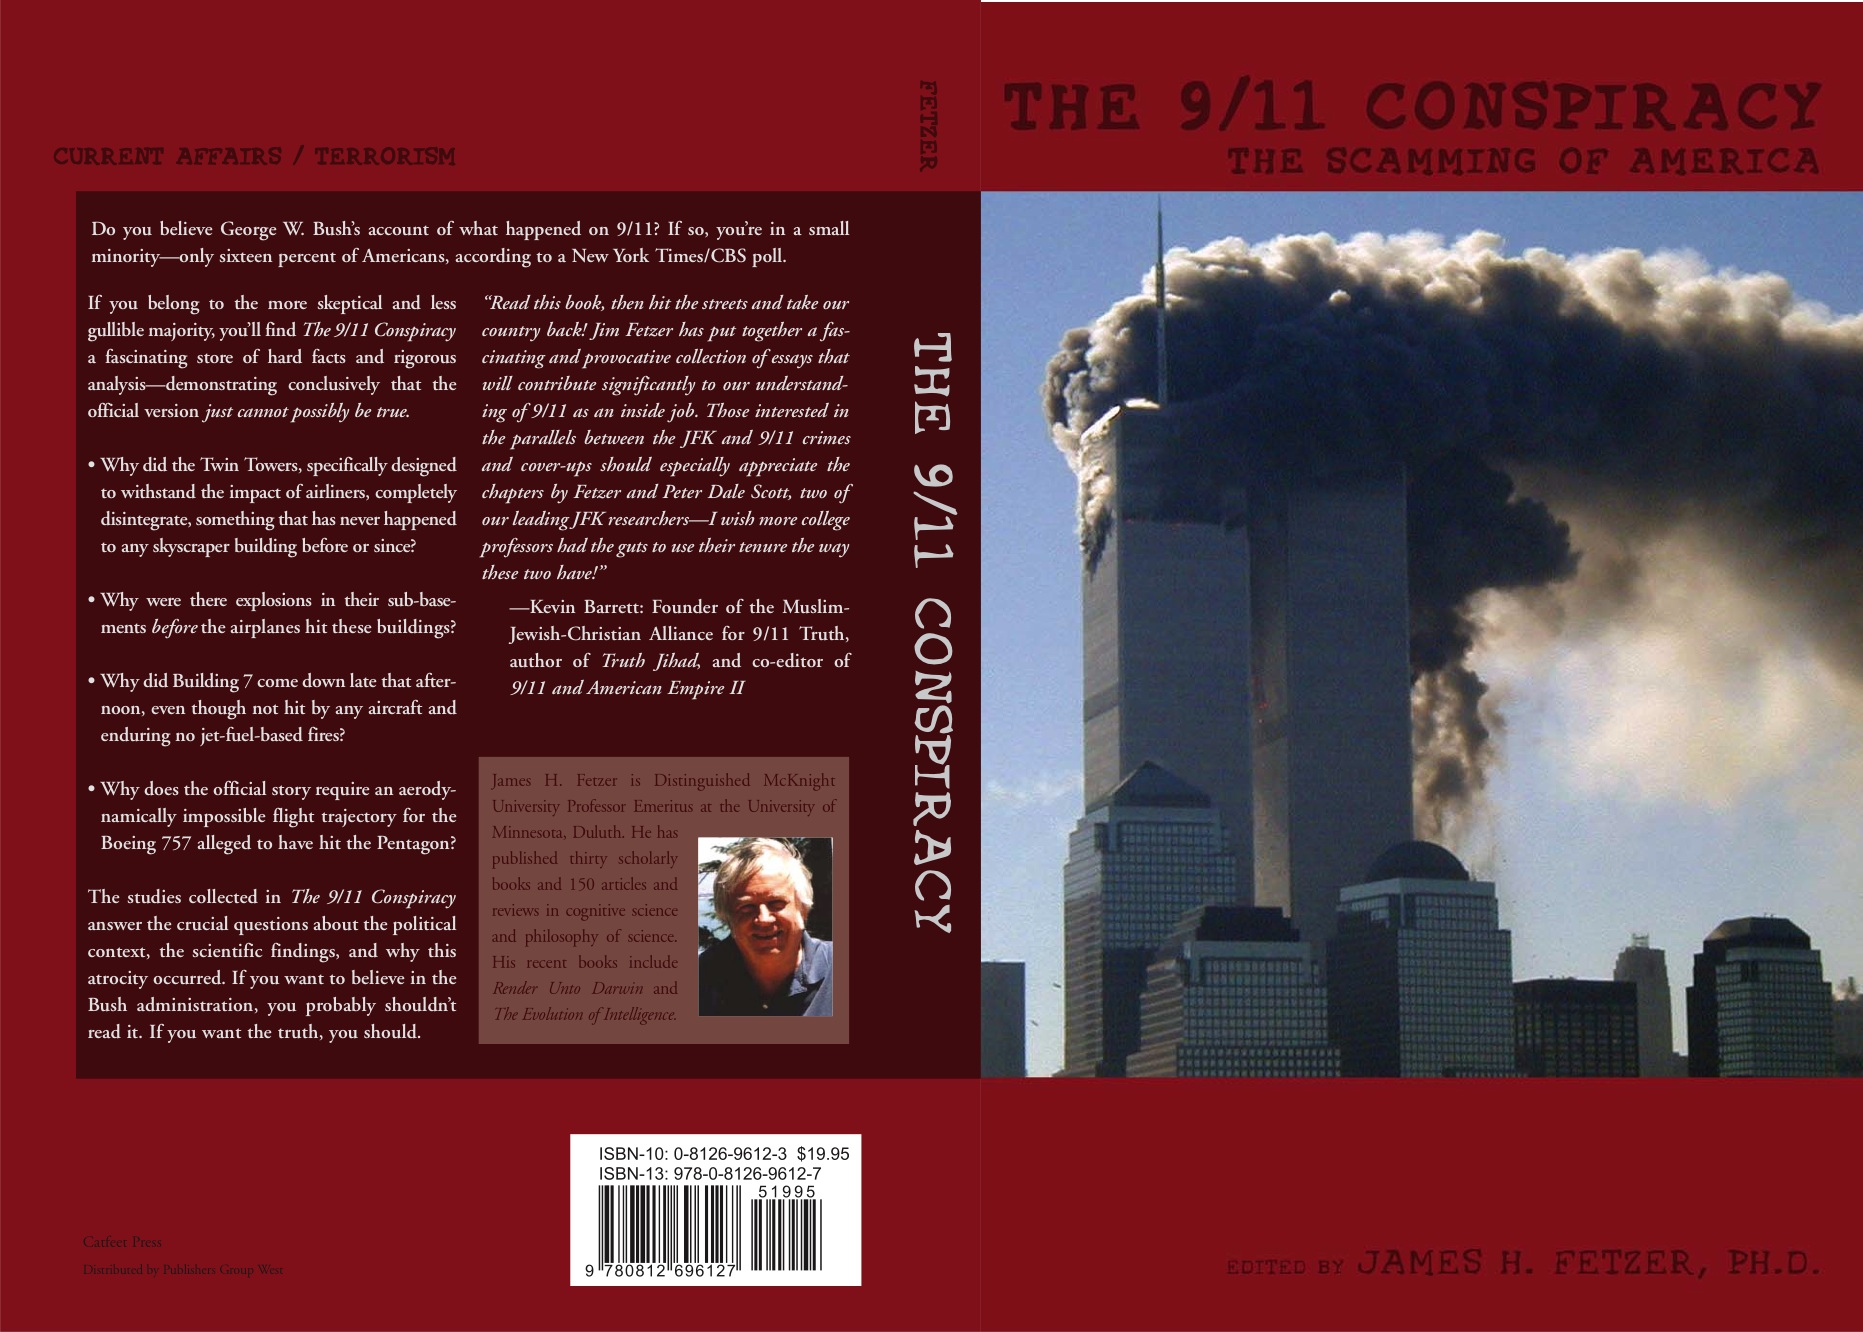 Jfk Quotes Wallpapers Brigham Woolridge Conspiracy Planet 9 11